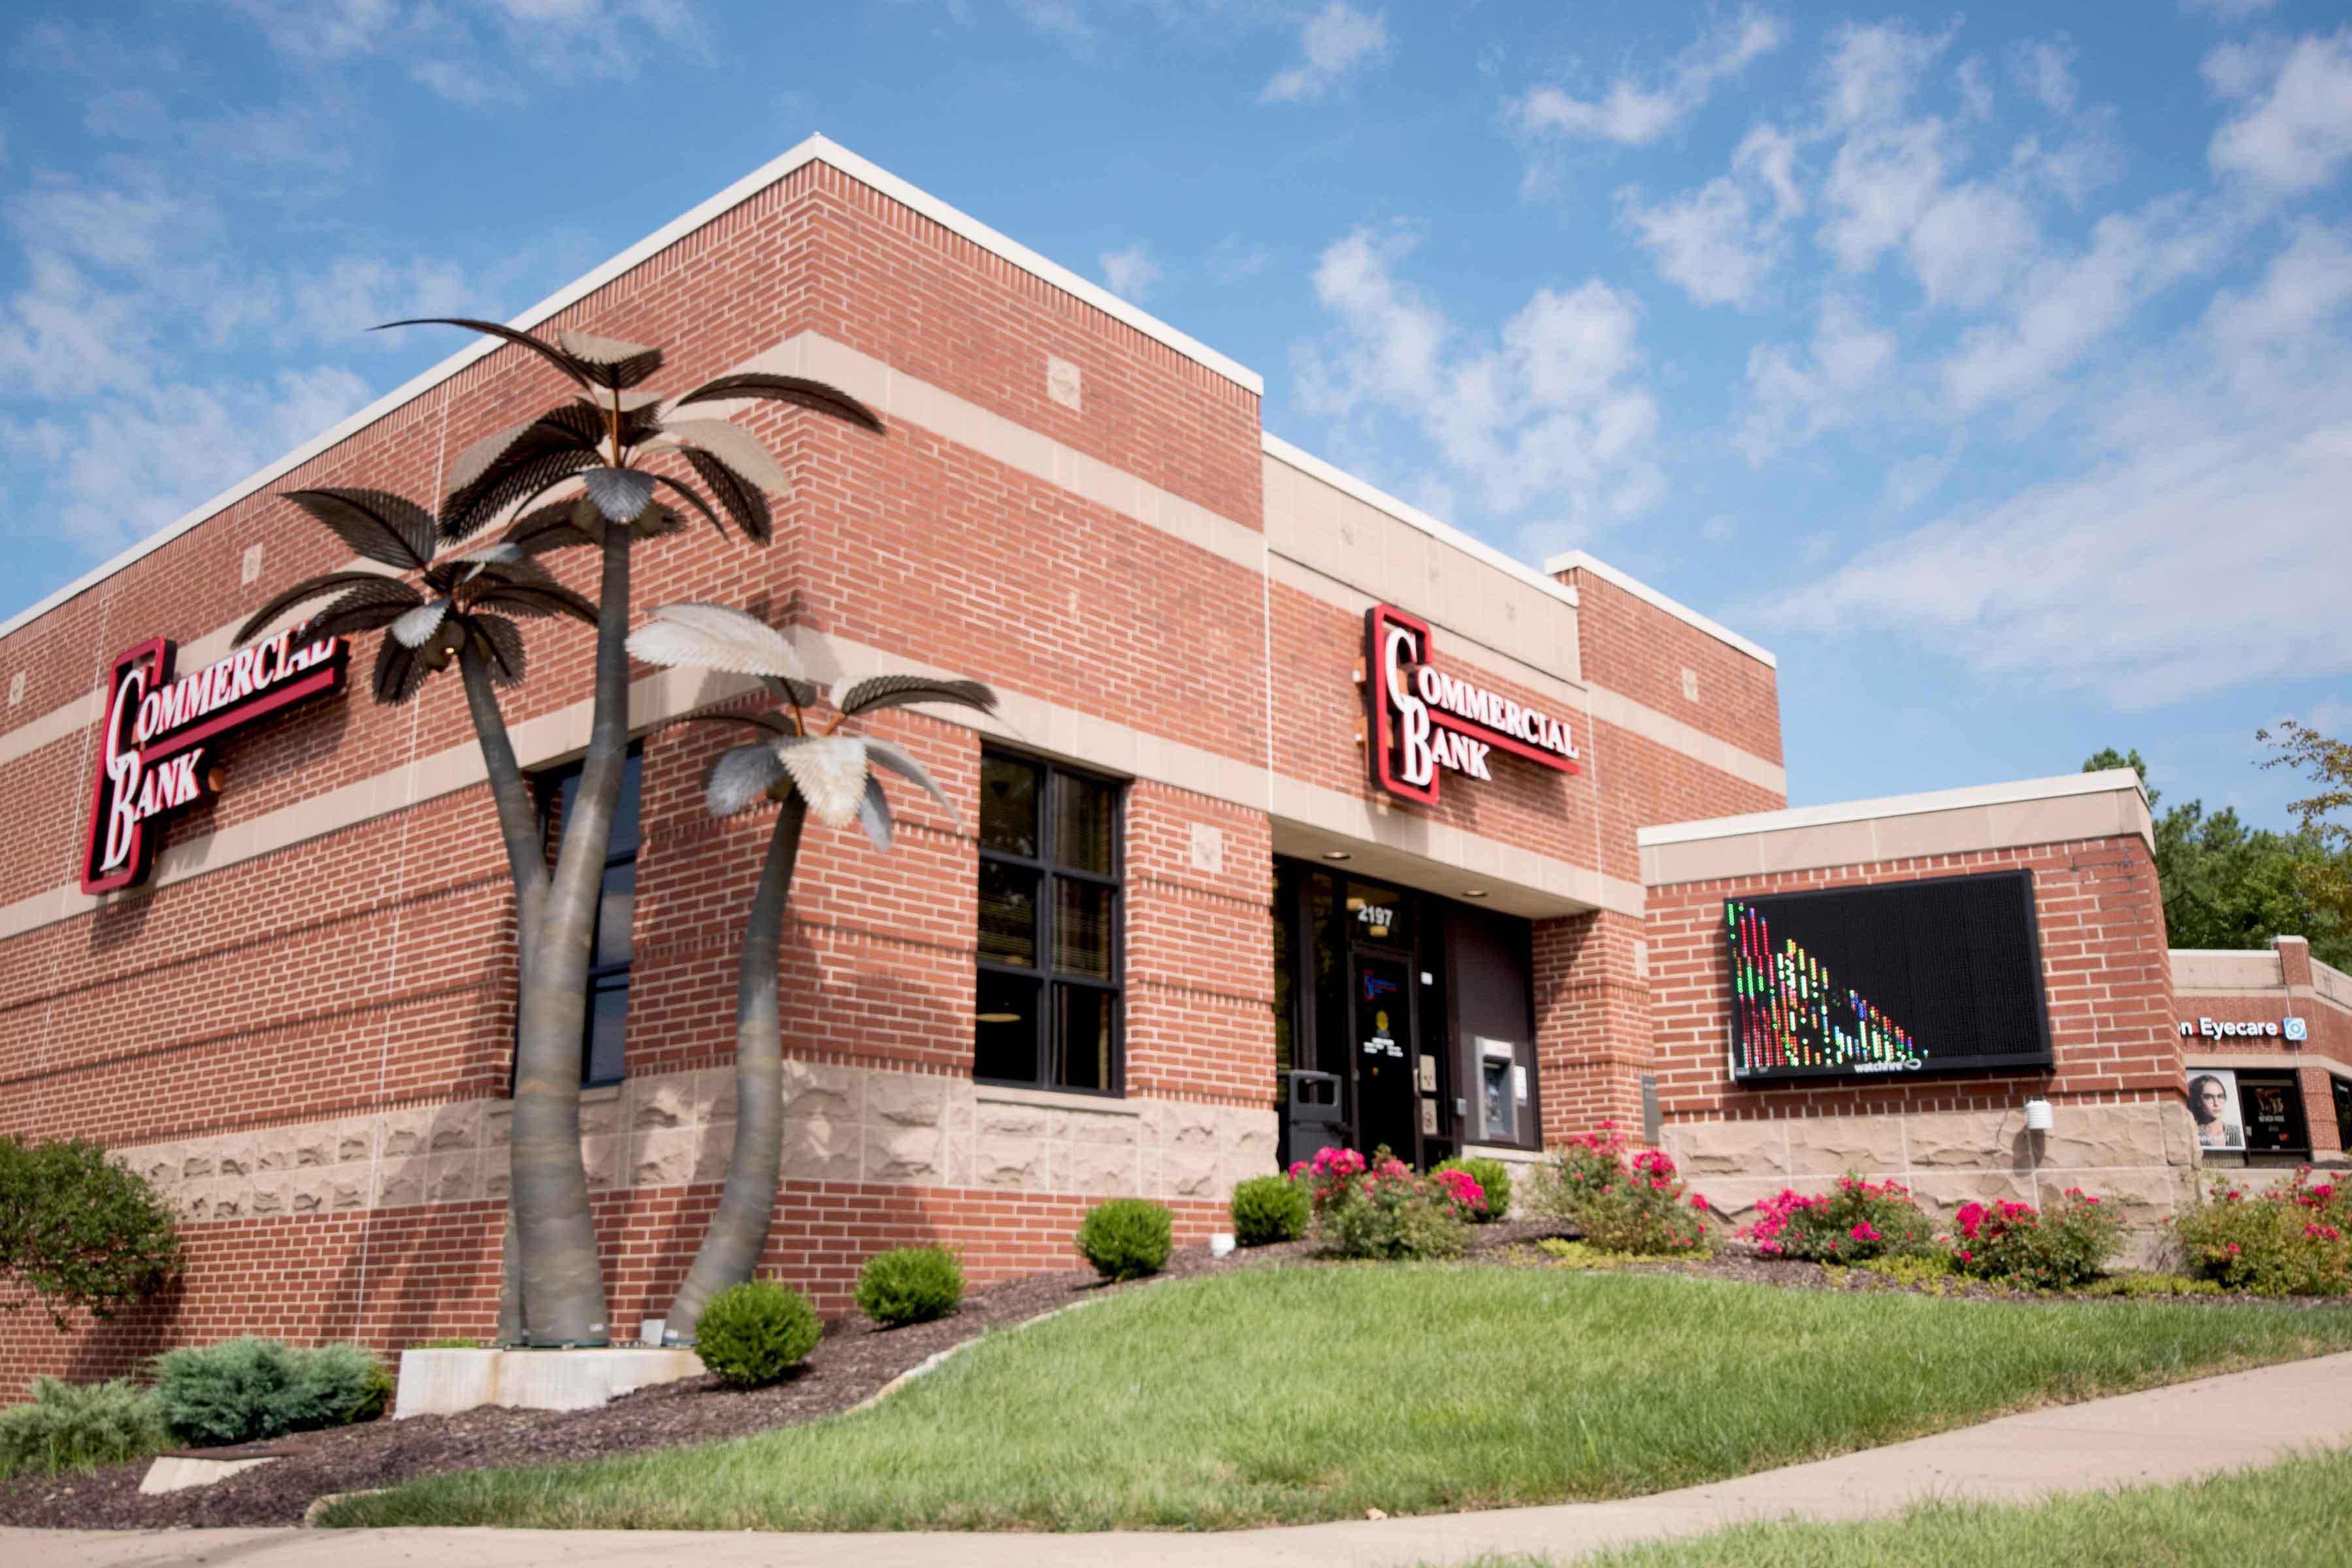 Commercial Real Estate Florida: Development & Leasing